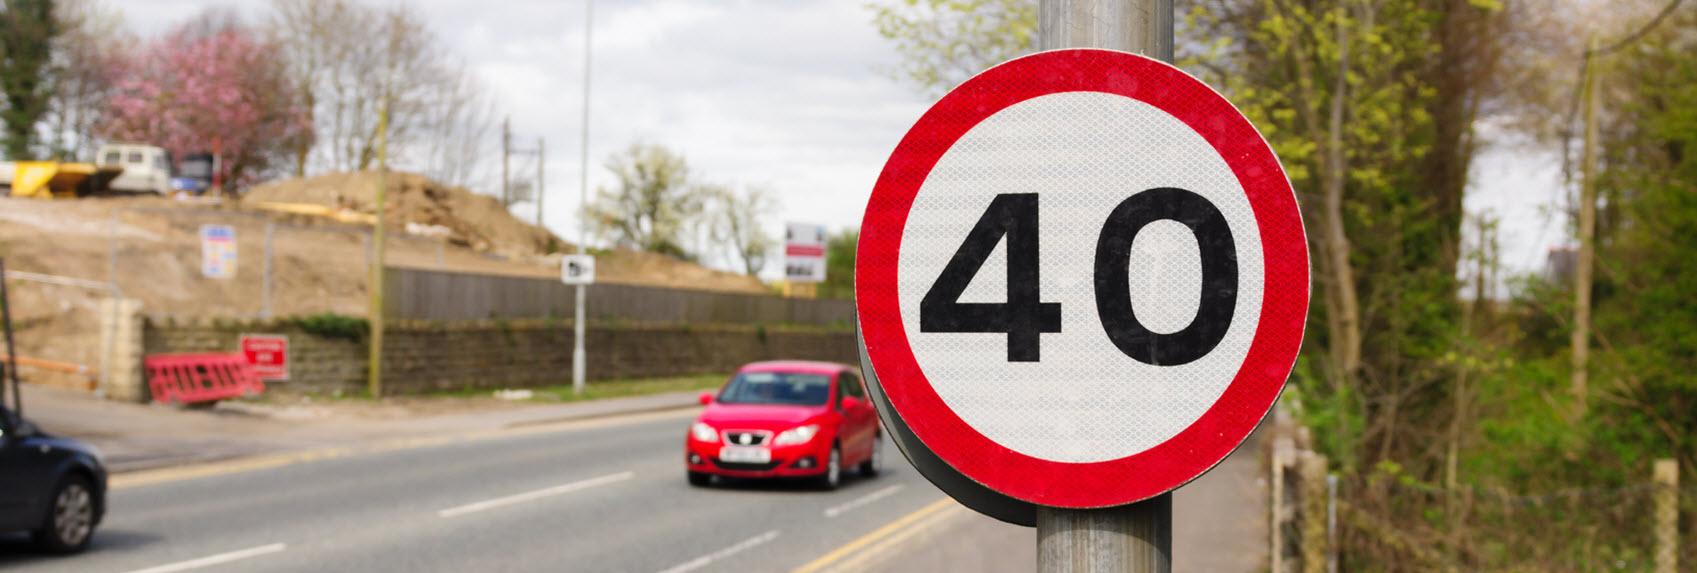 uk-speed-sign-40